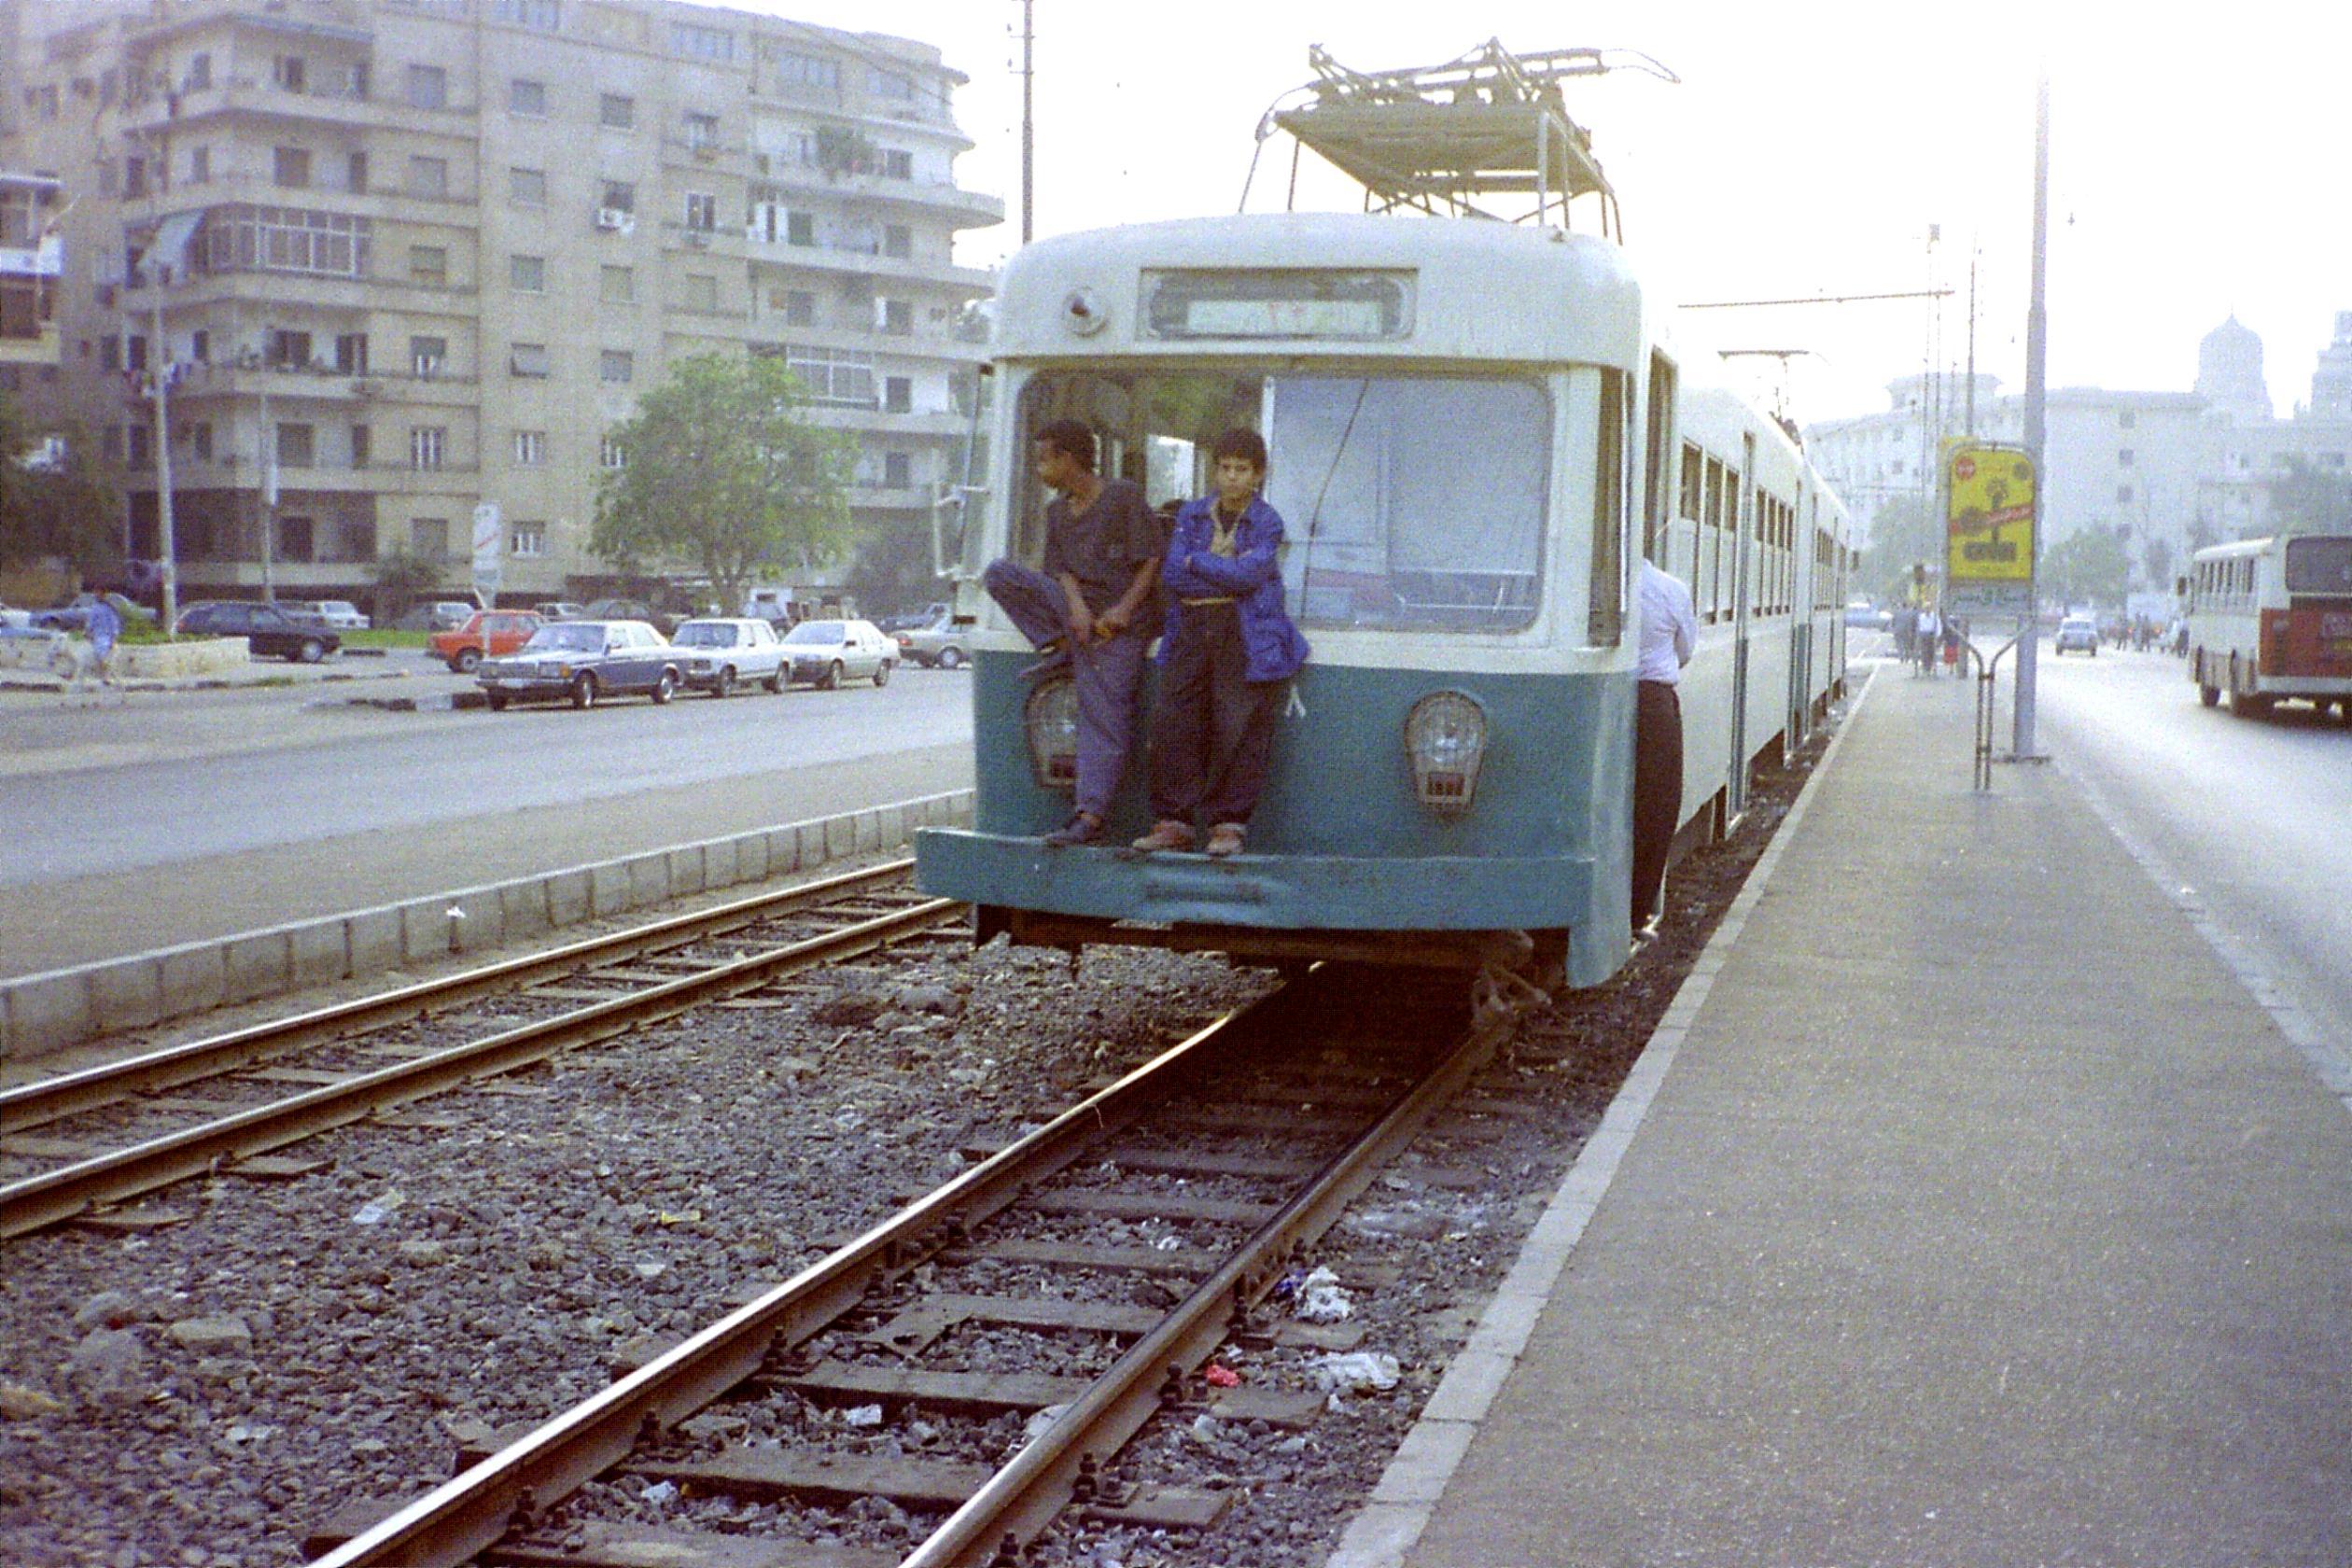 Cairo-Tram-Fare-Dodger-We-Are-Railfans